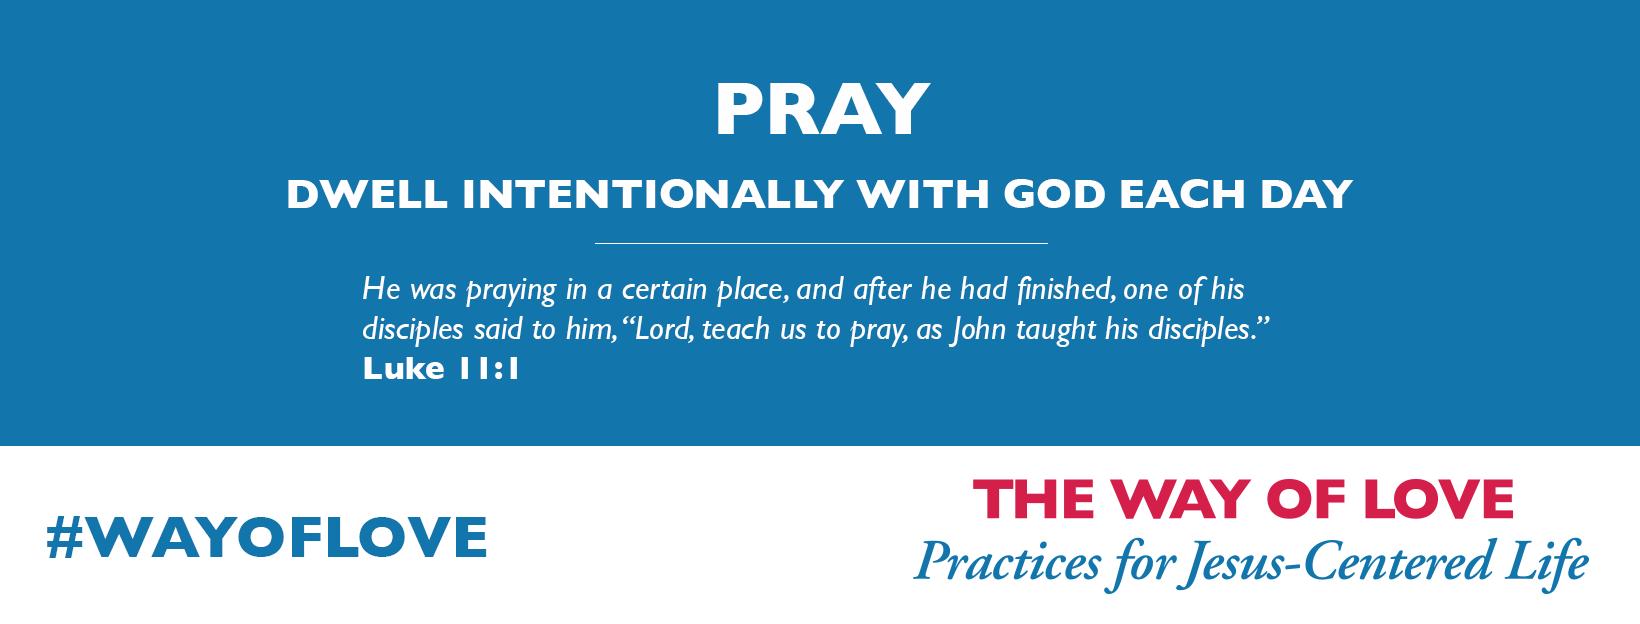 Way of Love - Pray